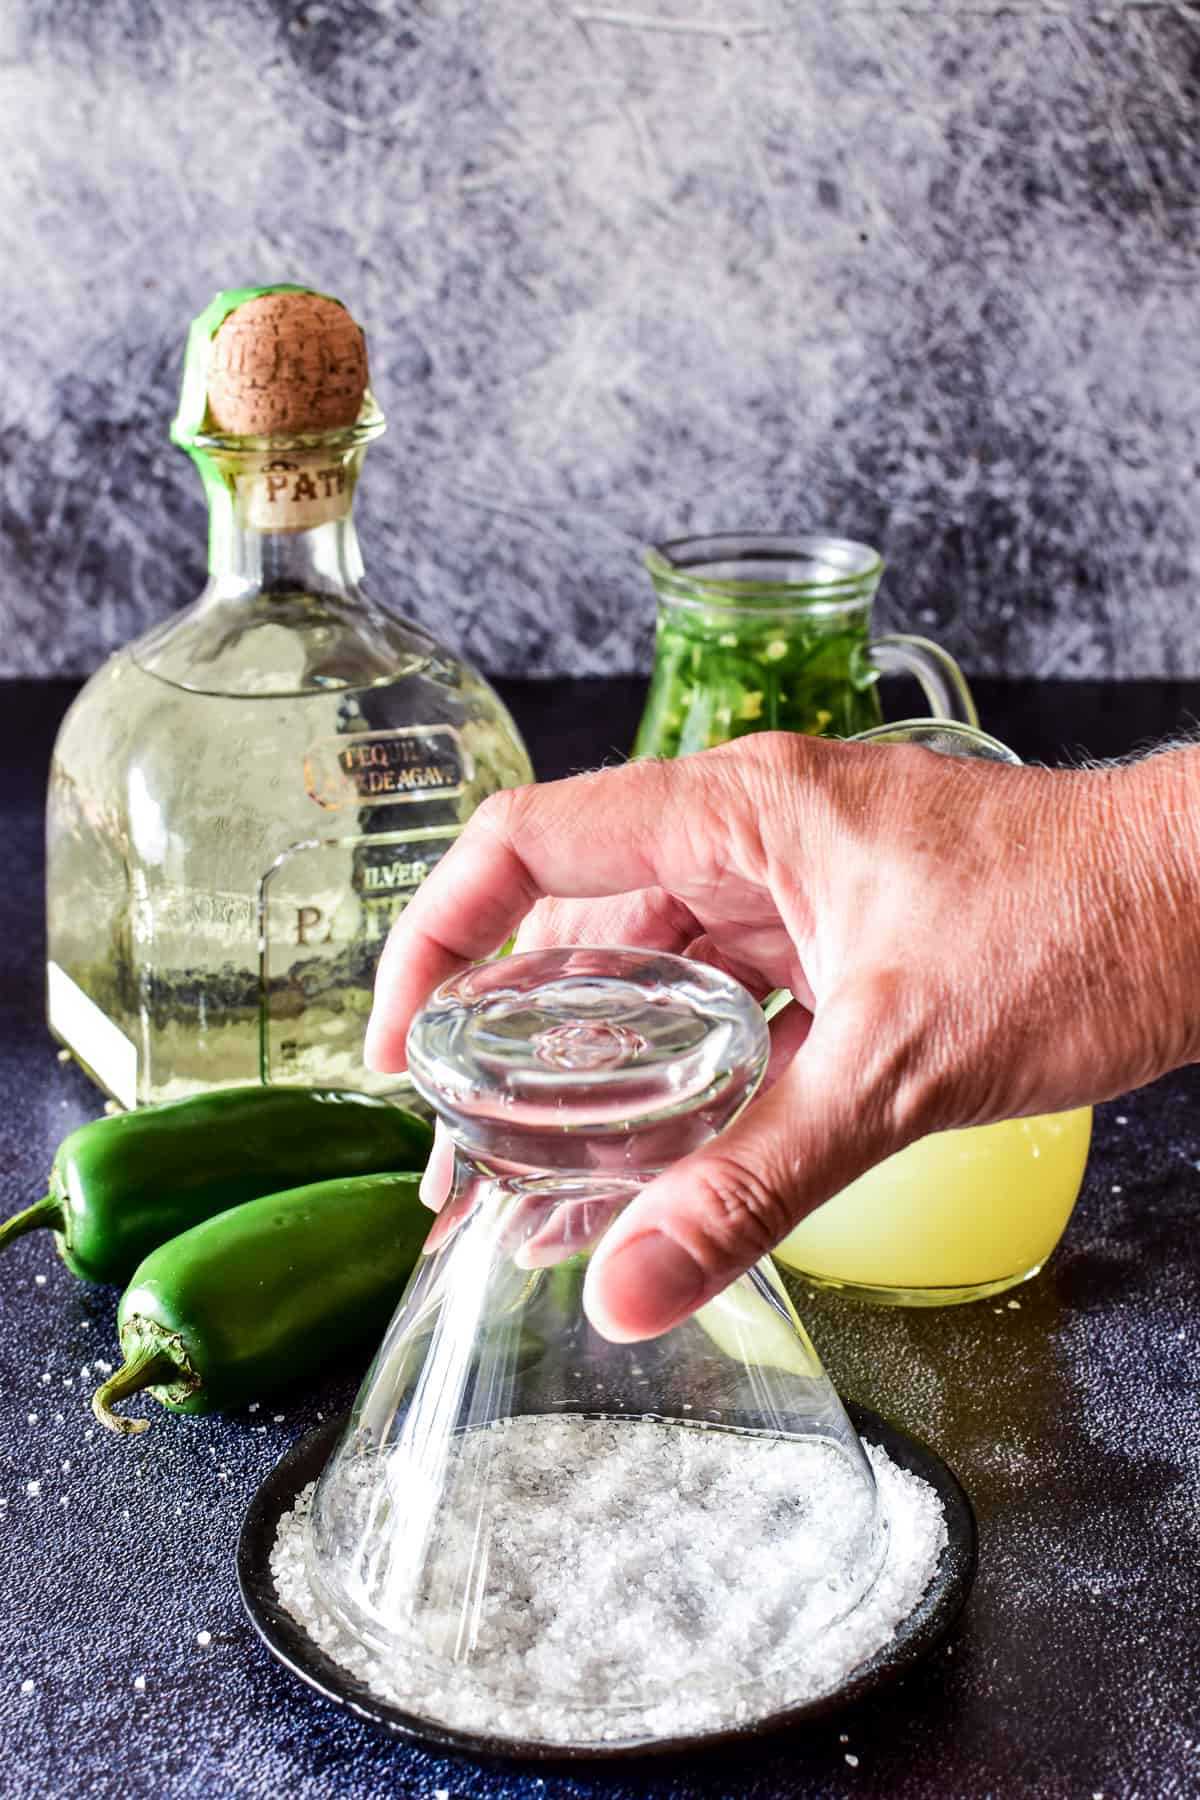 Dipping glass rim in salt